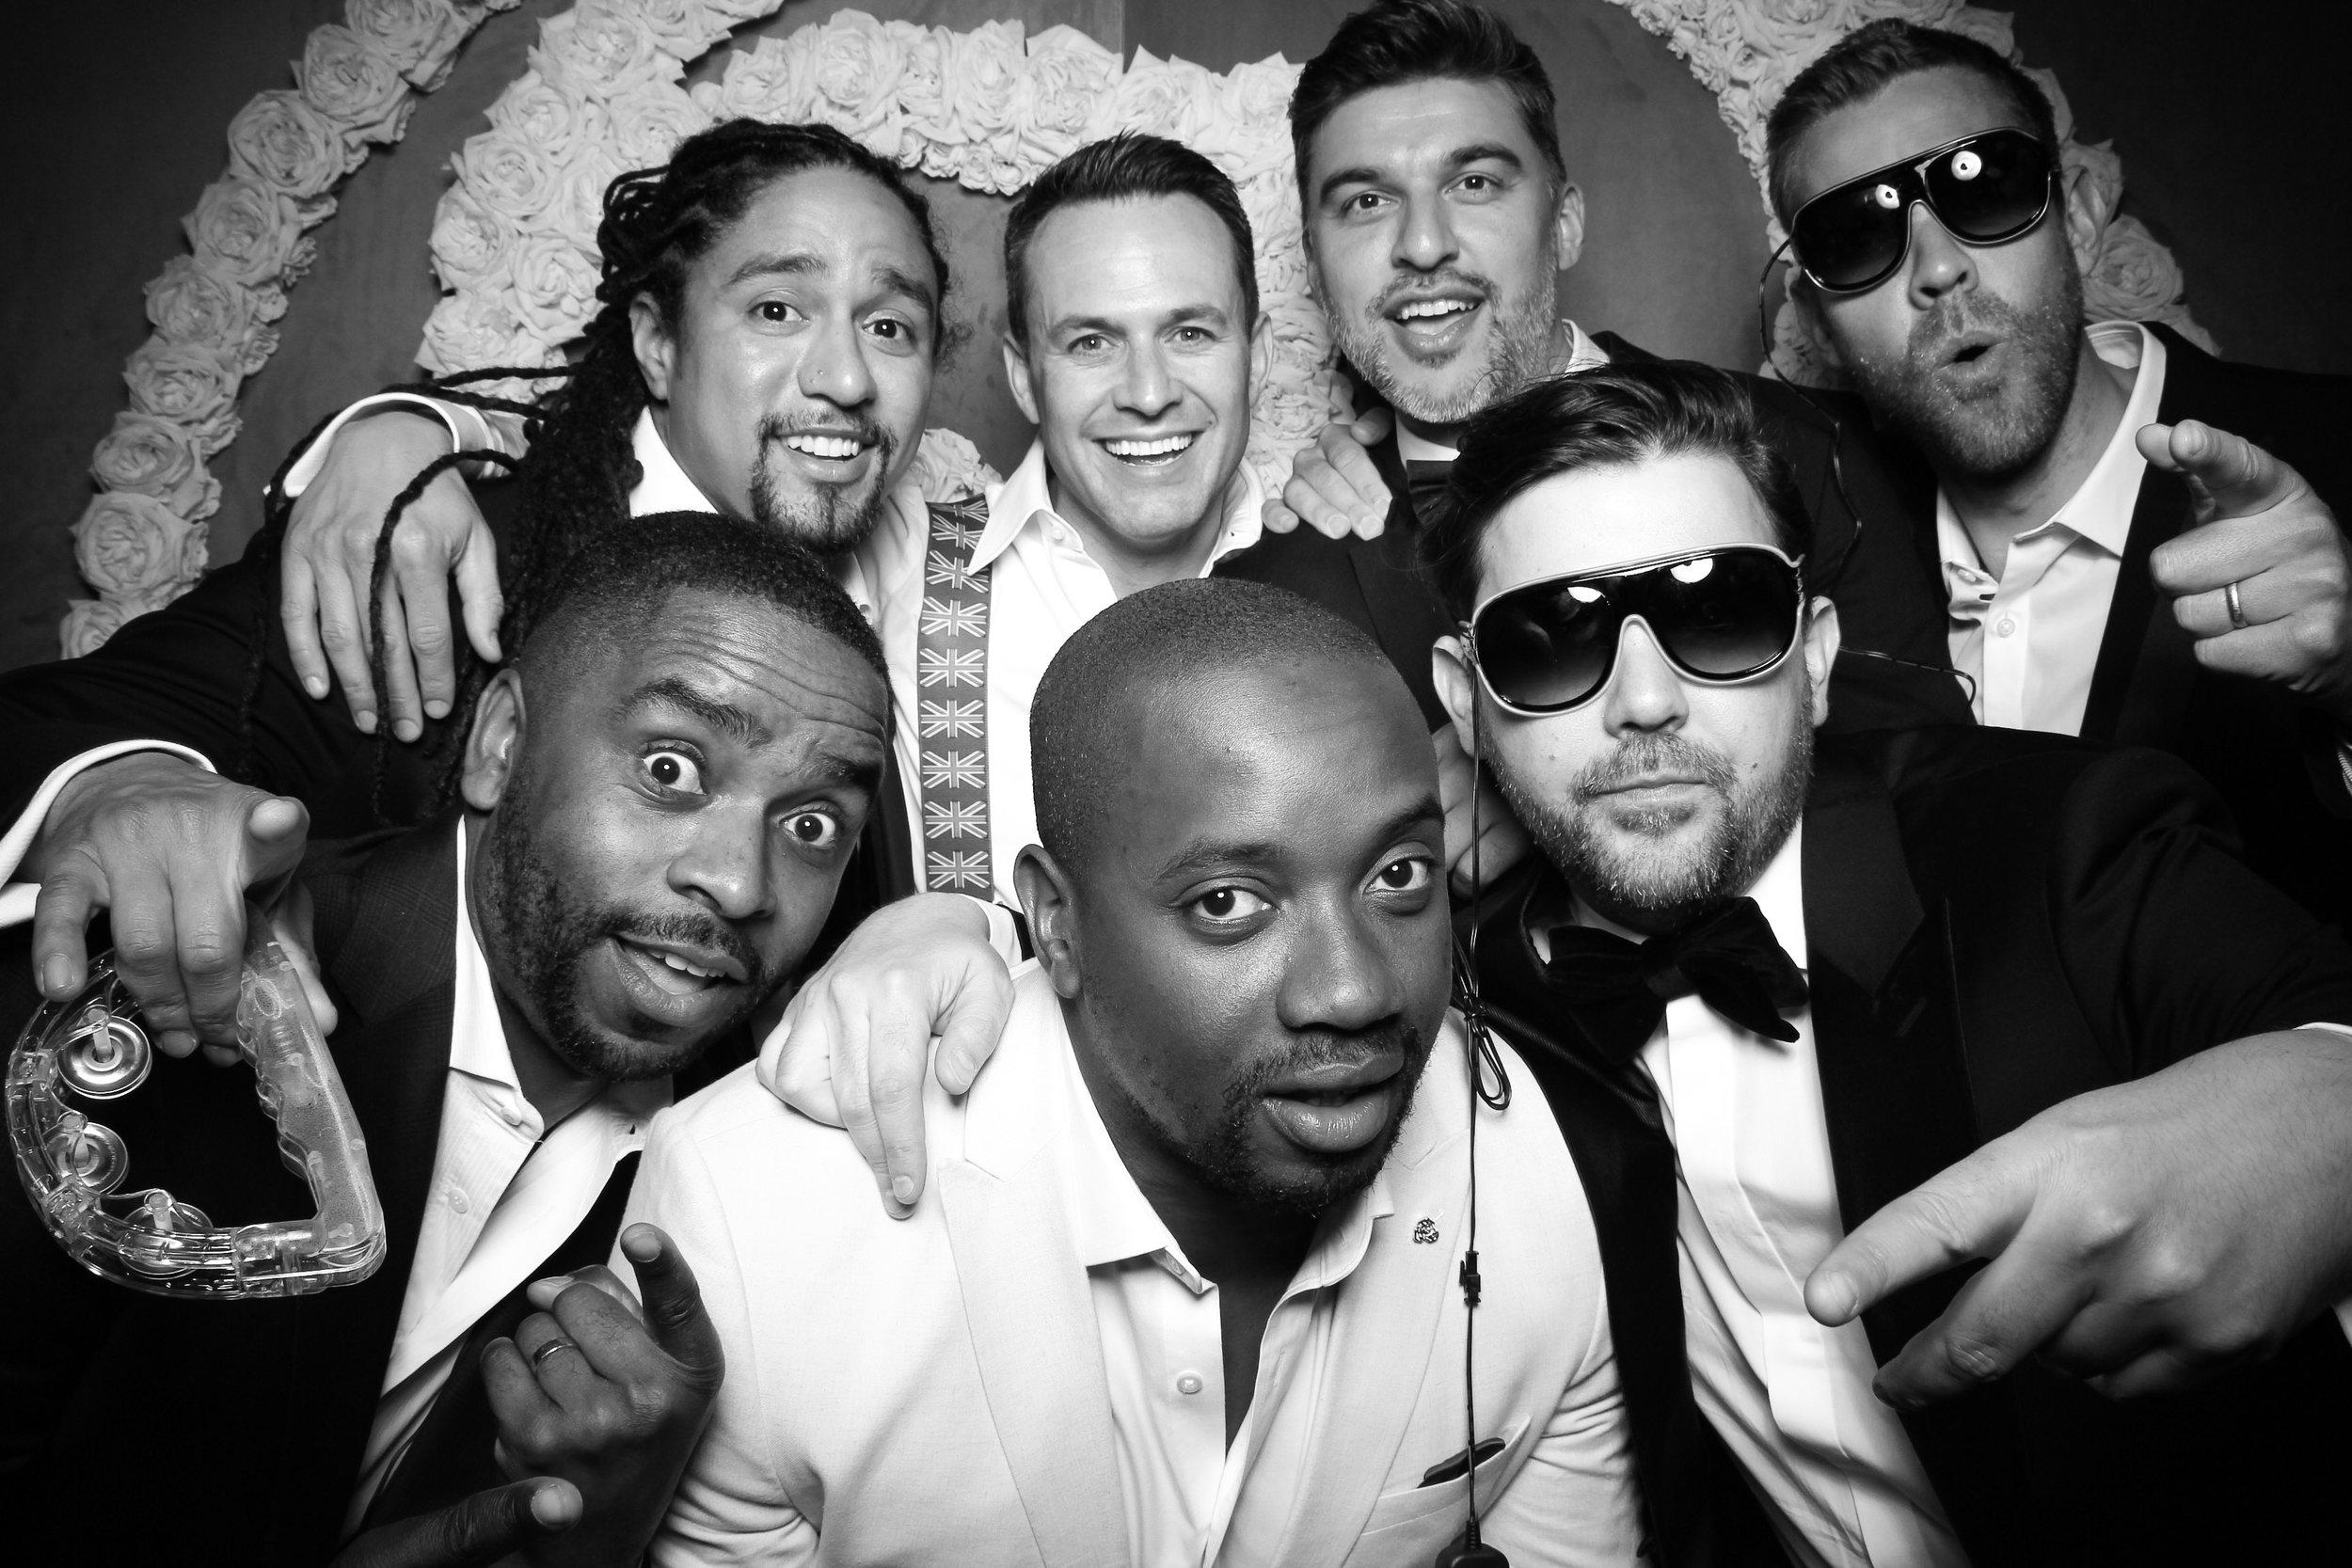 Photo_Booth_Rental_At_Standard_Club_Wedding_Chicago_08.jpg